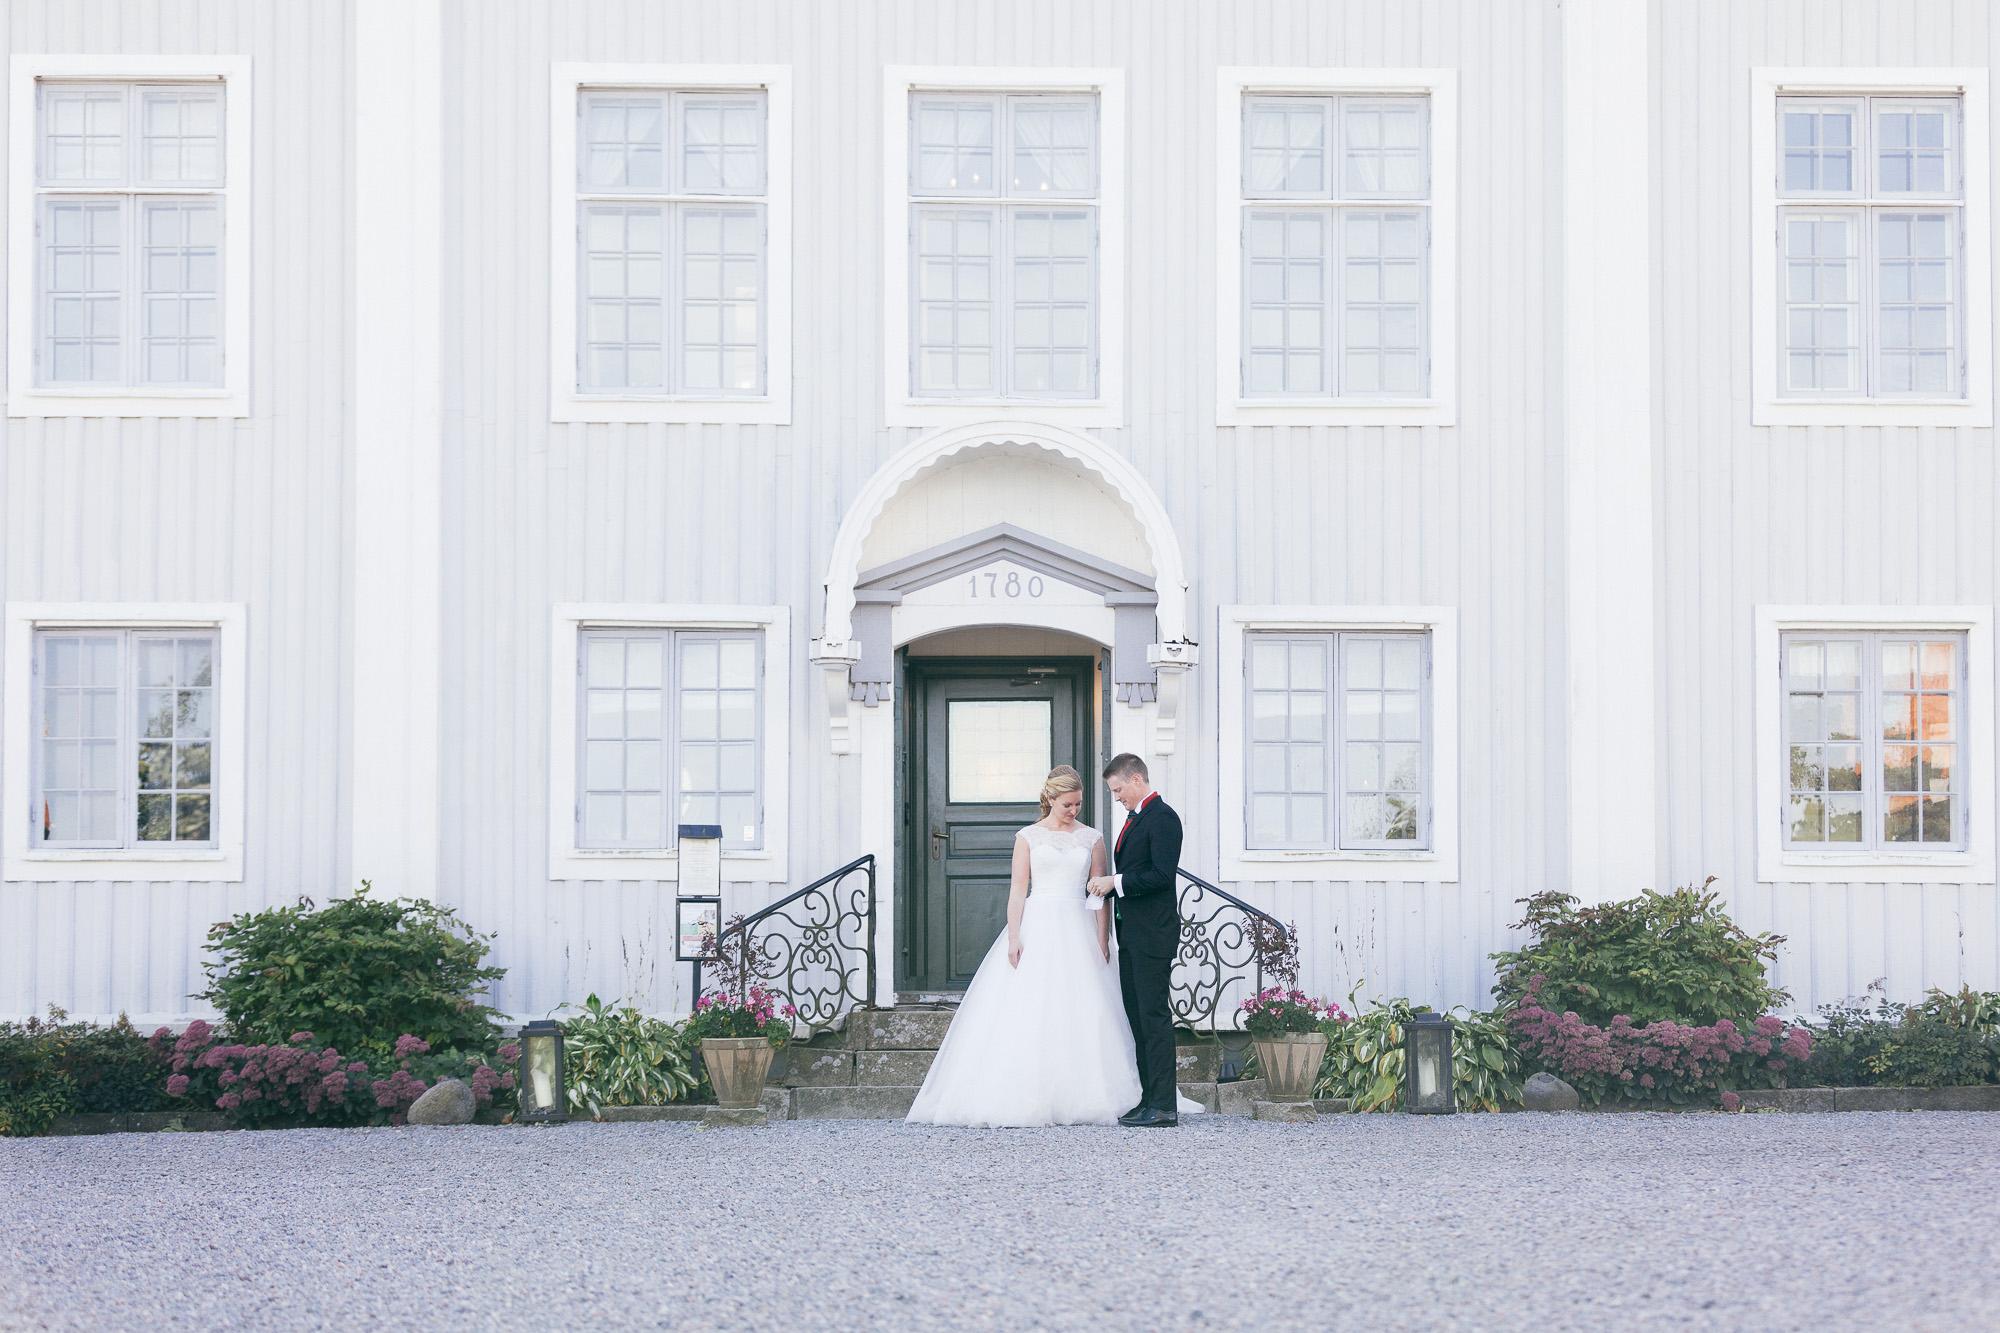 Sofia & Markus